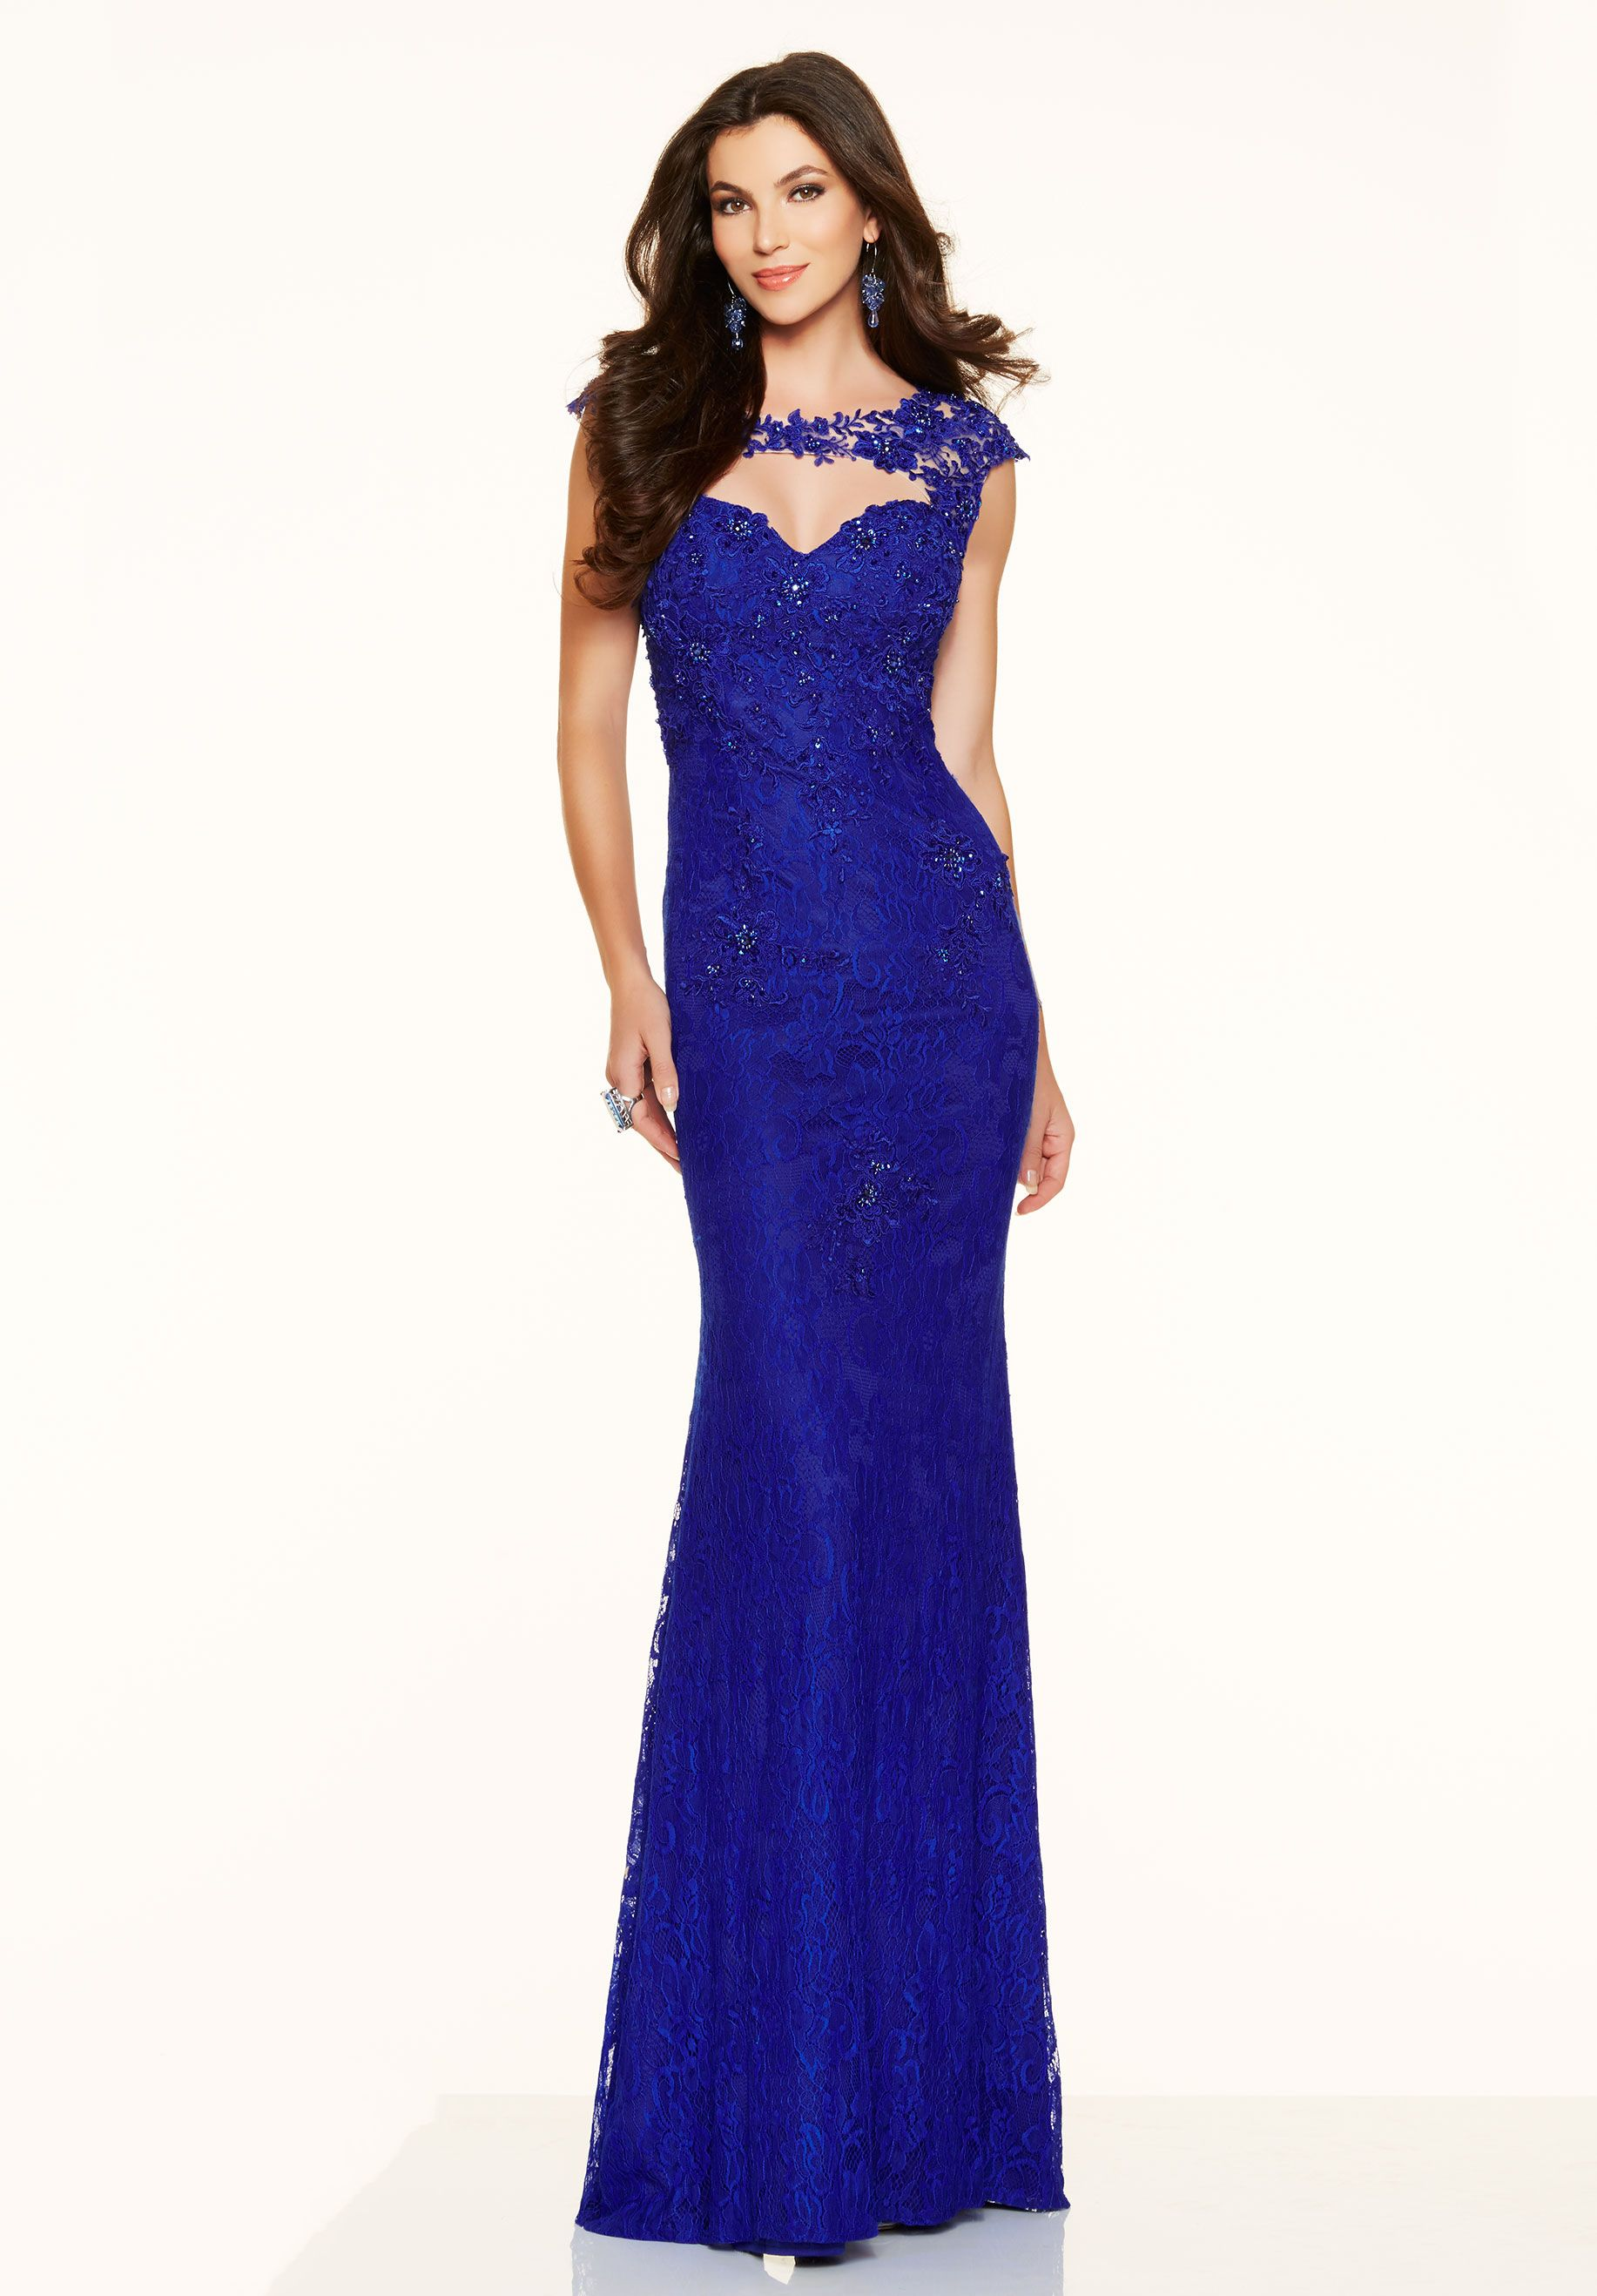 Royal+Blue+Illusion+Lace+Cut+Out+Sheath+Column+Prom+Dress+Cpa0201 ...